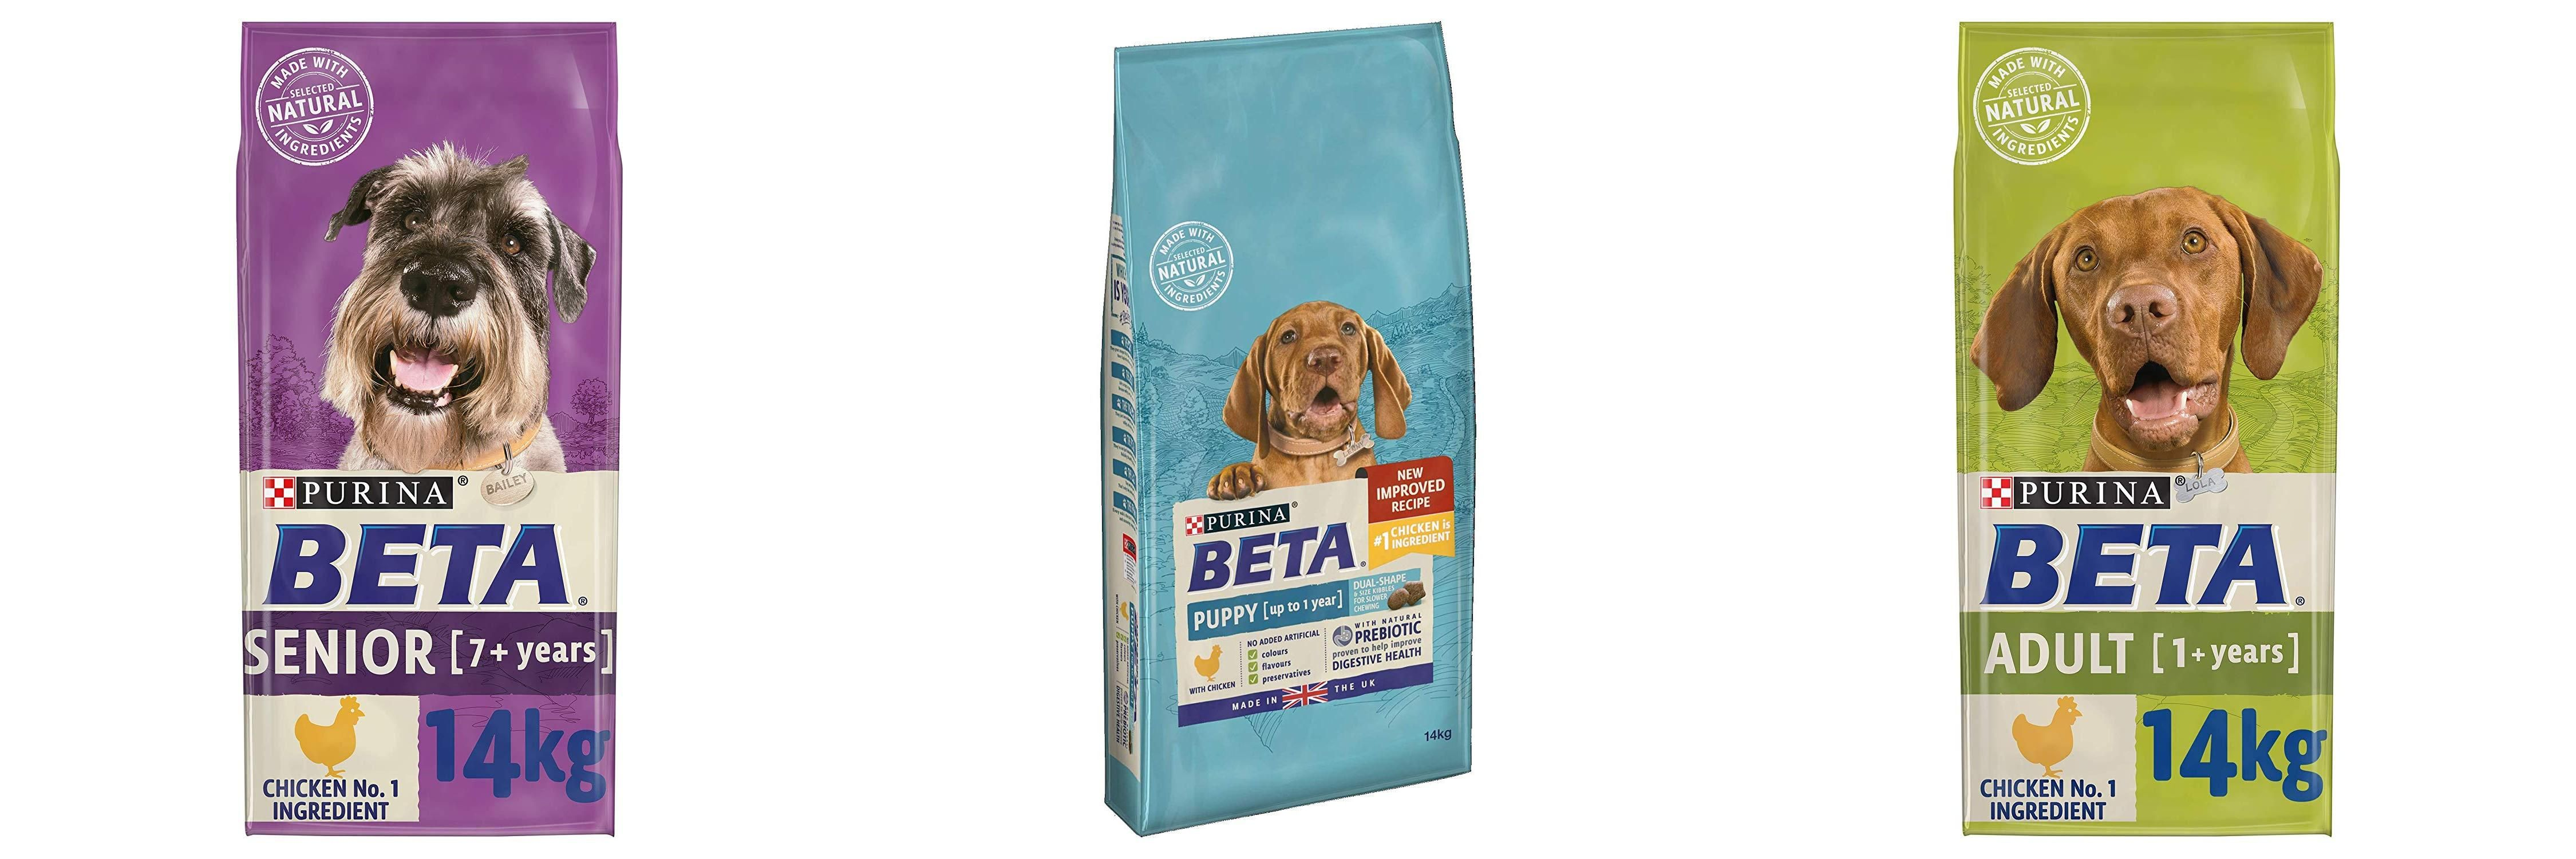 beta dog foods